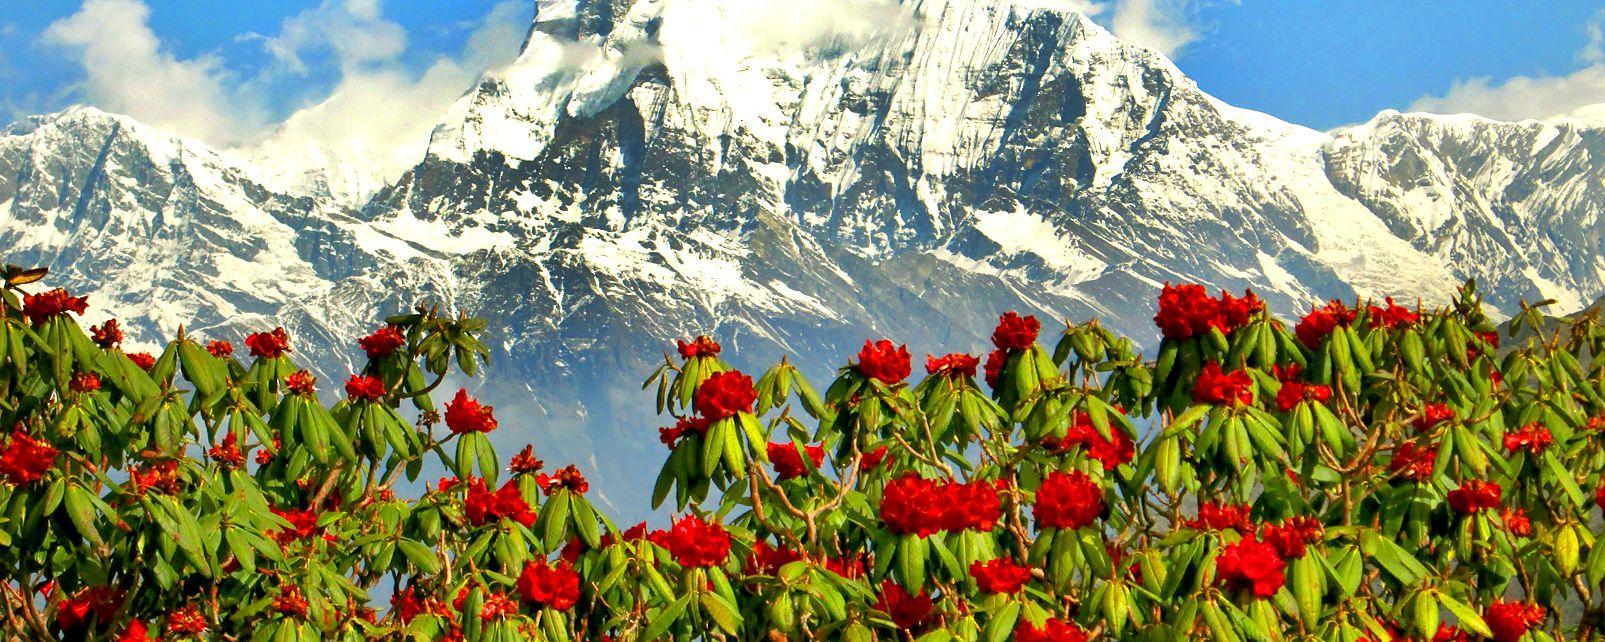 La flora , La flora, Nepal , Nepal